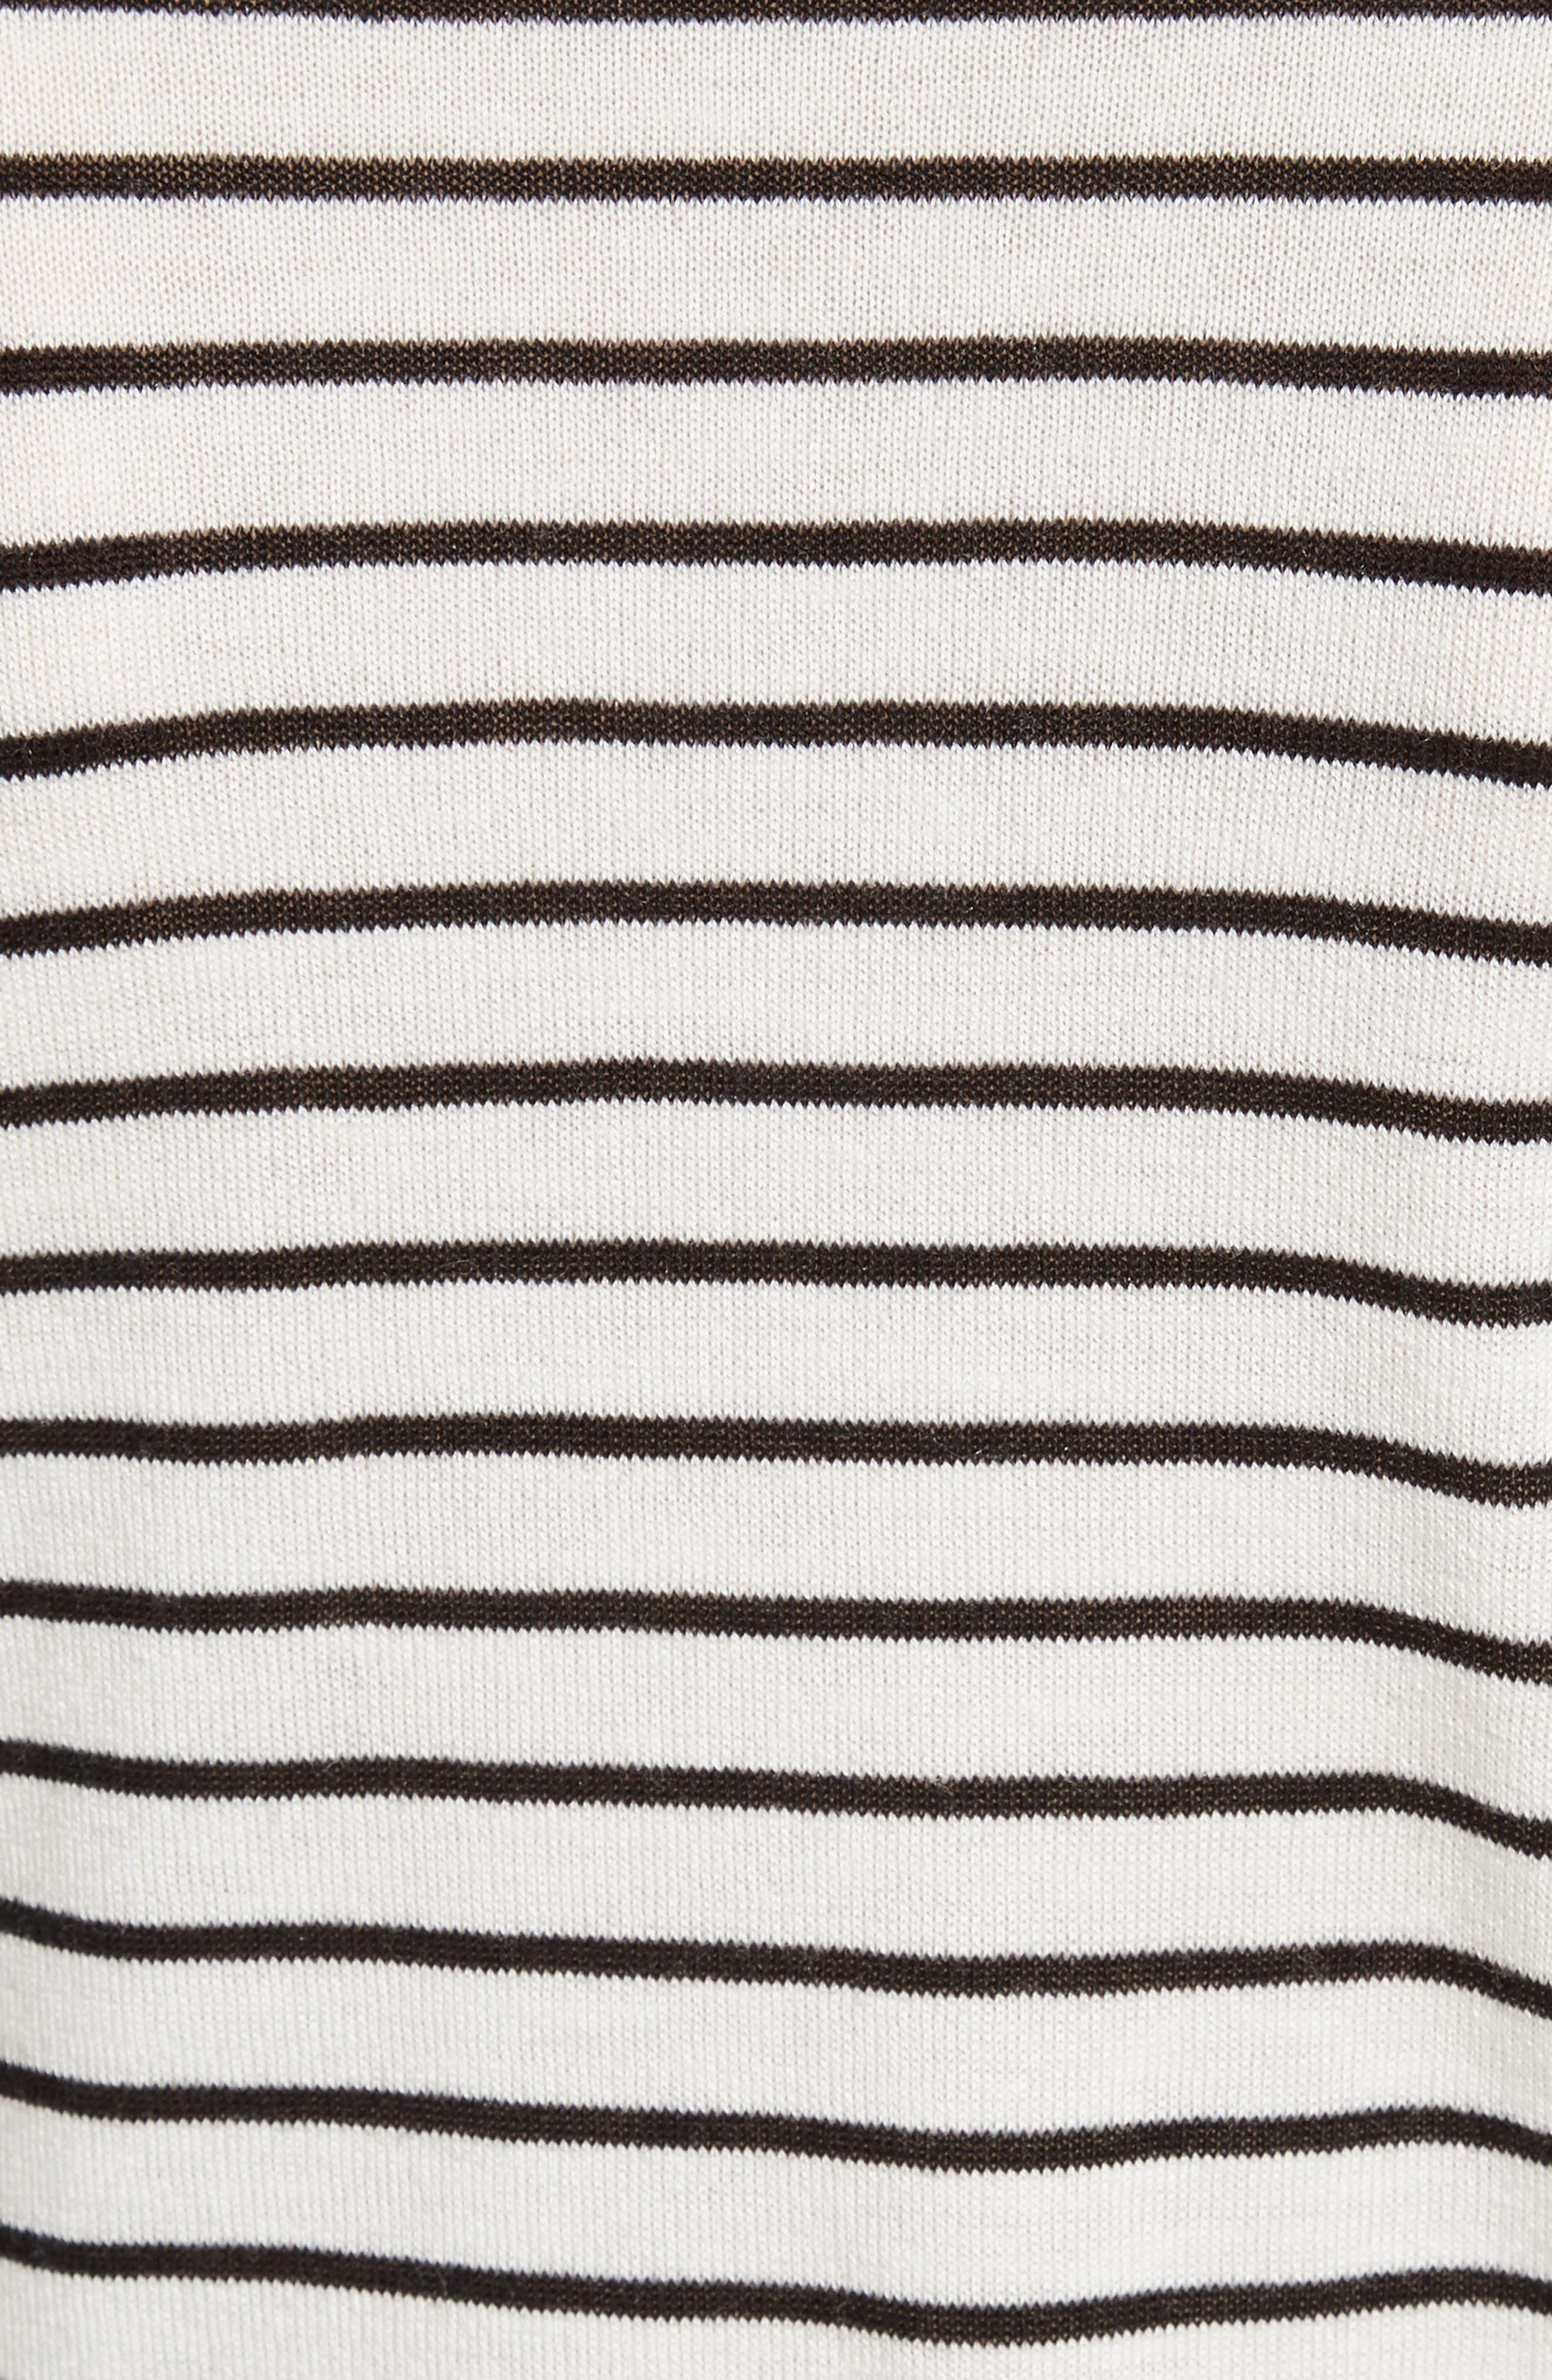 Stripe Silk Blend Sweater,                             Alternate thumbnail 5, color,                             Chalk/ Black